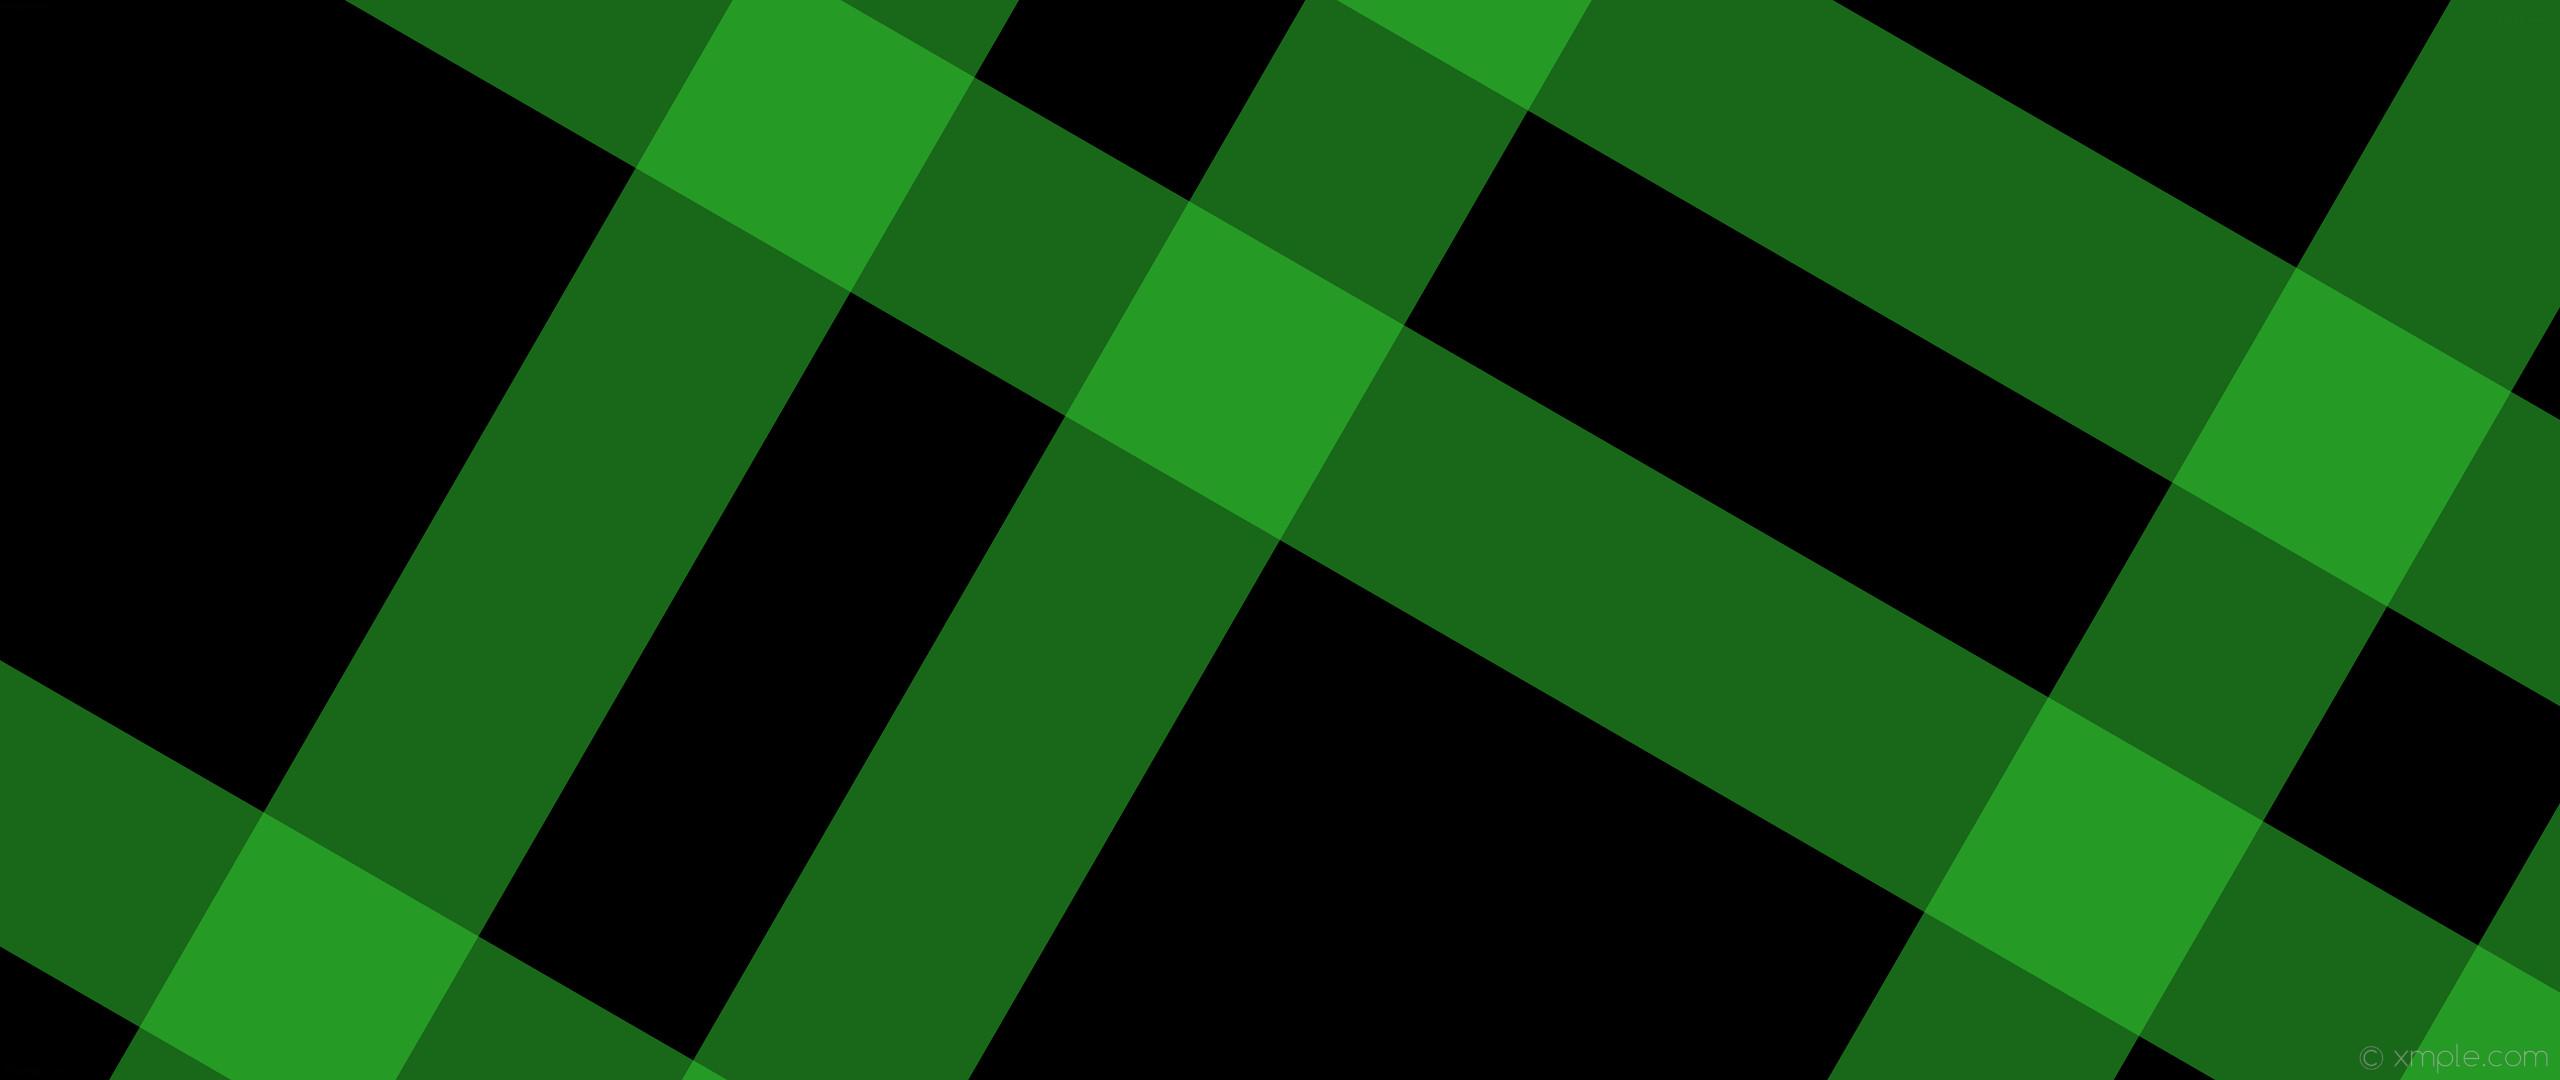 wallpaper striped green black gingham dual lime green #000000 #32cd32 150°  248px